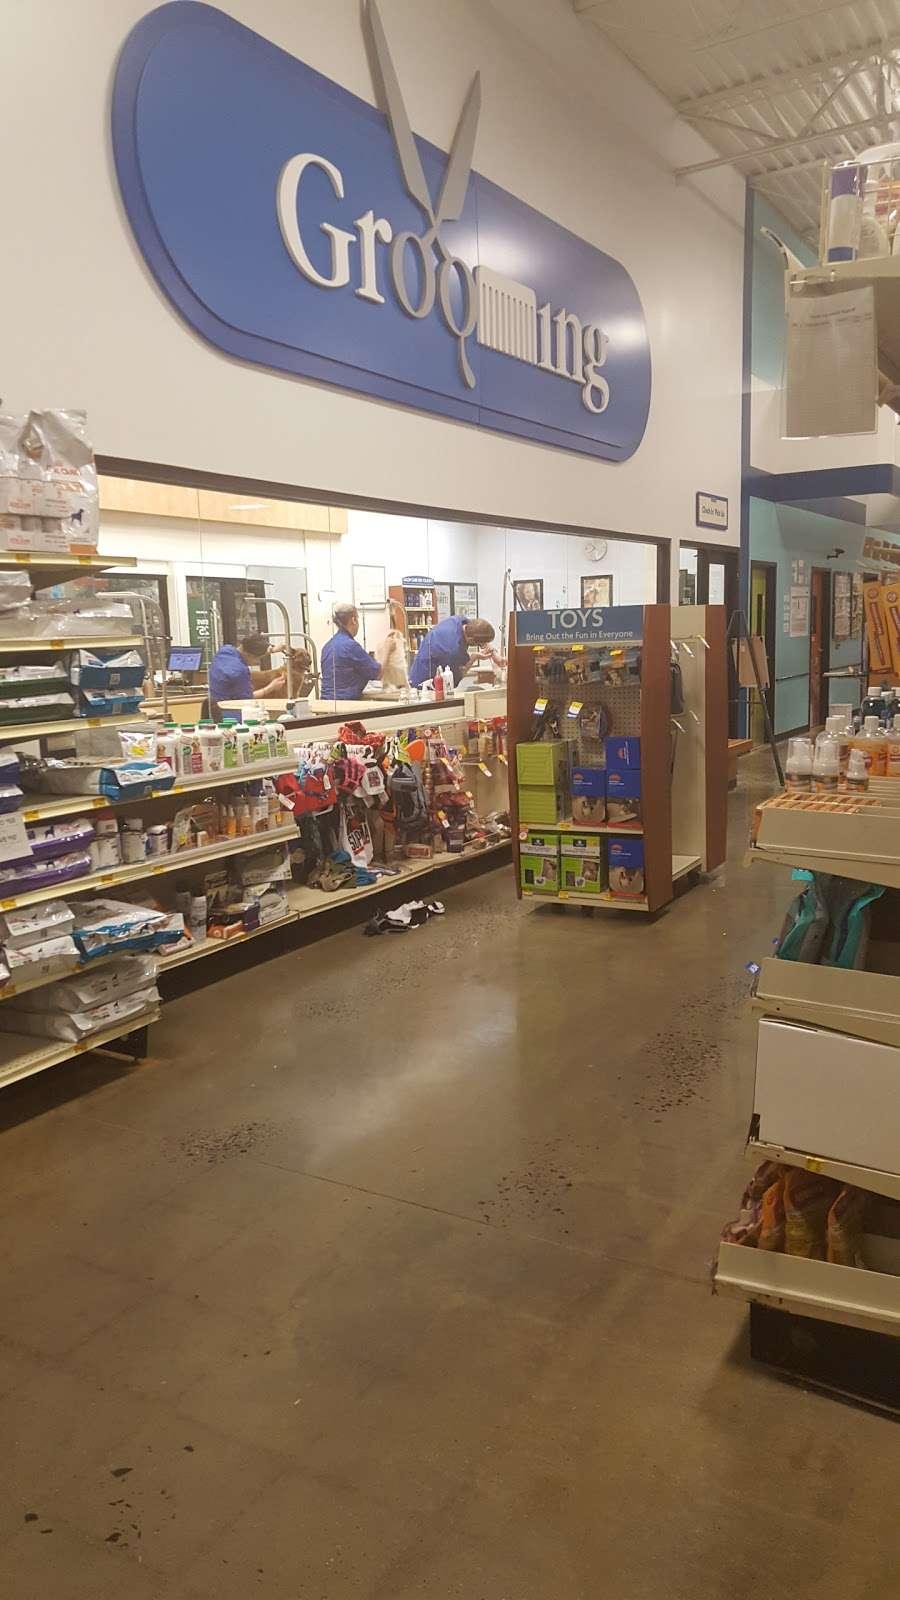 PetSmart - veterinary care  | Photo 6 of 10 | Address: 170 Marketplace Blvd, Hamilton Township, NJ 08691, USA | Phone: (609) 585-4418